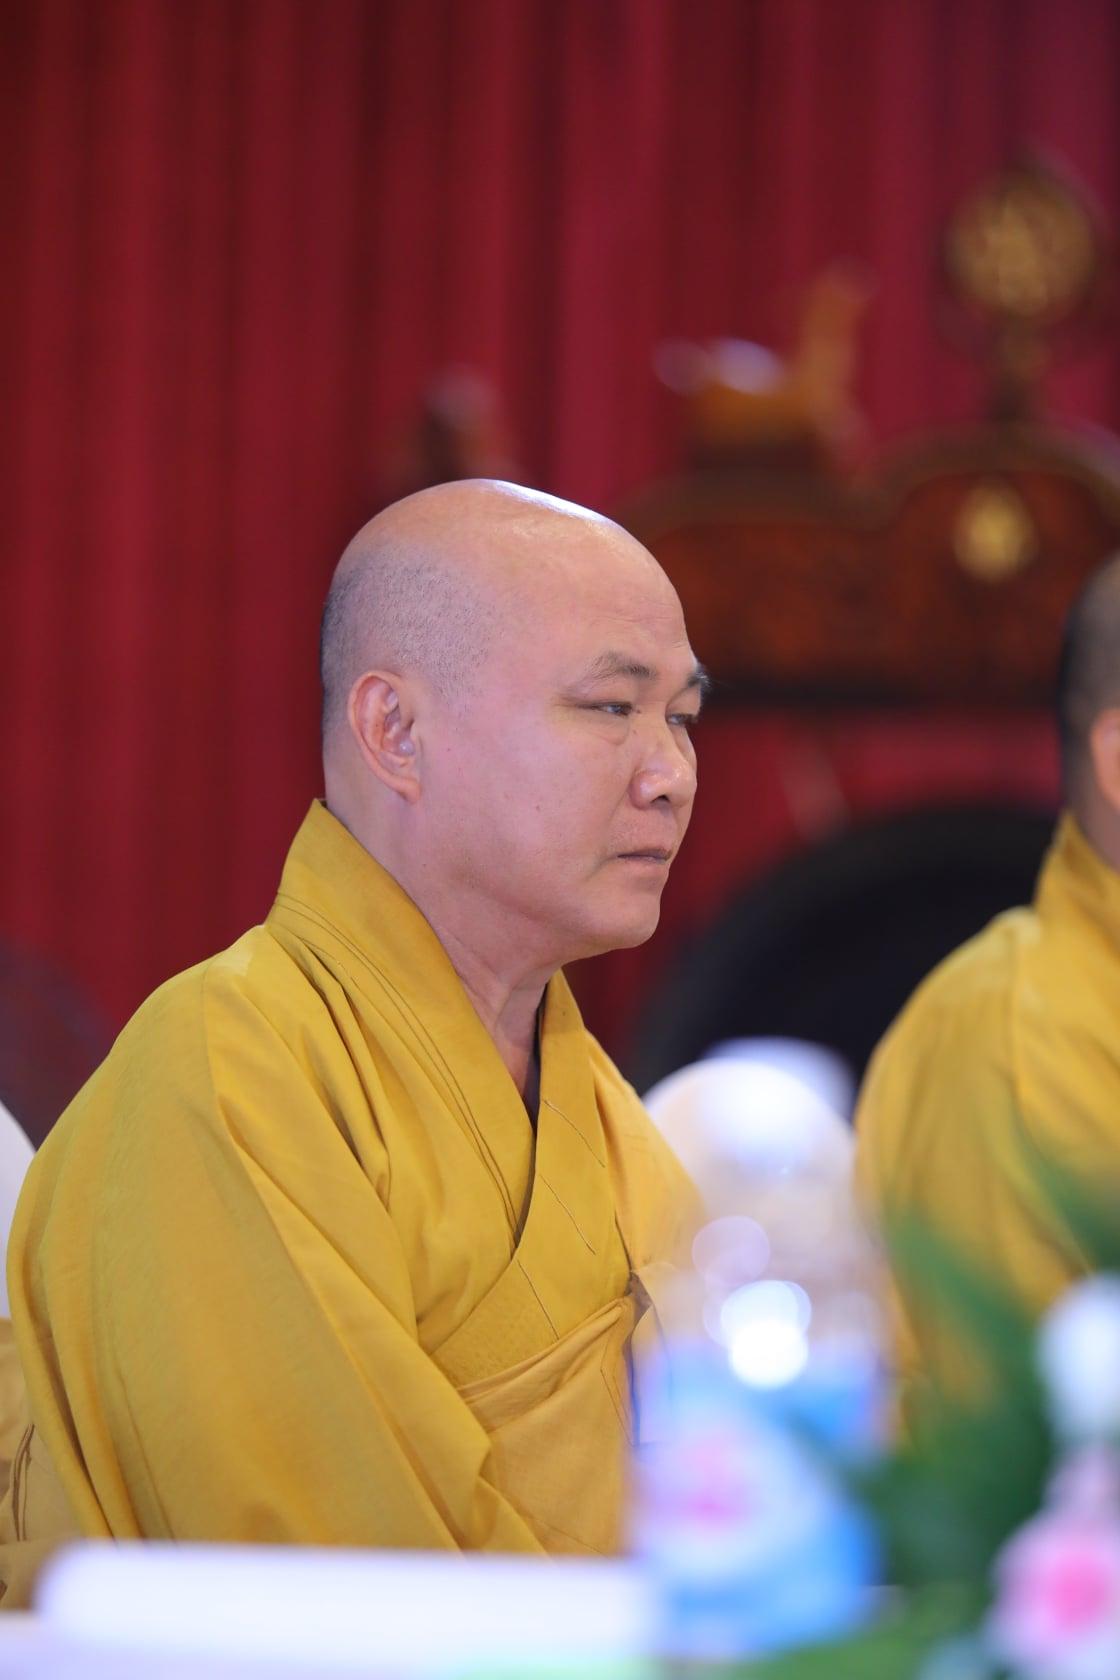 Thang Nghiem Dai Gioi Dan IV (20)